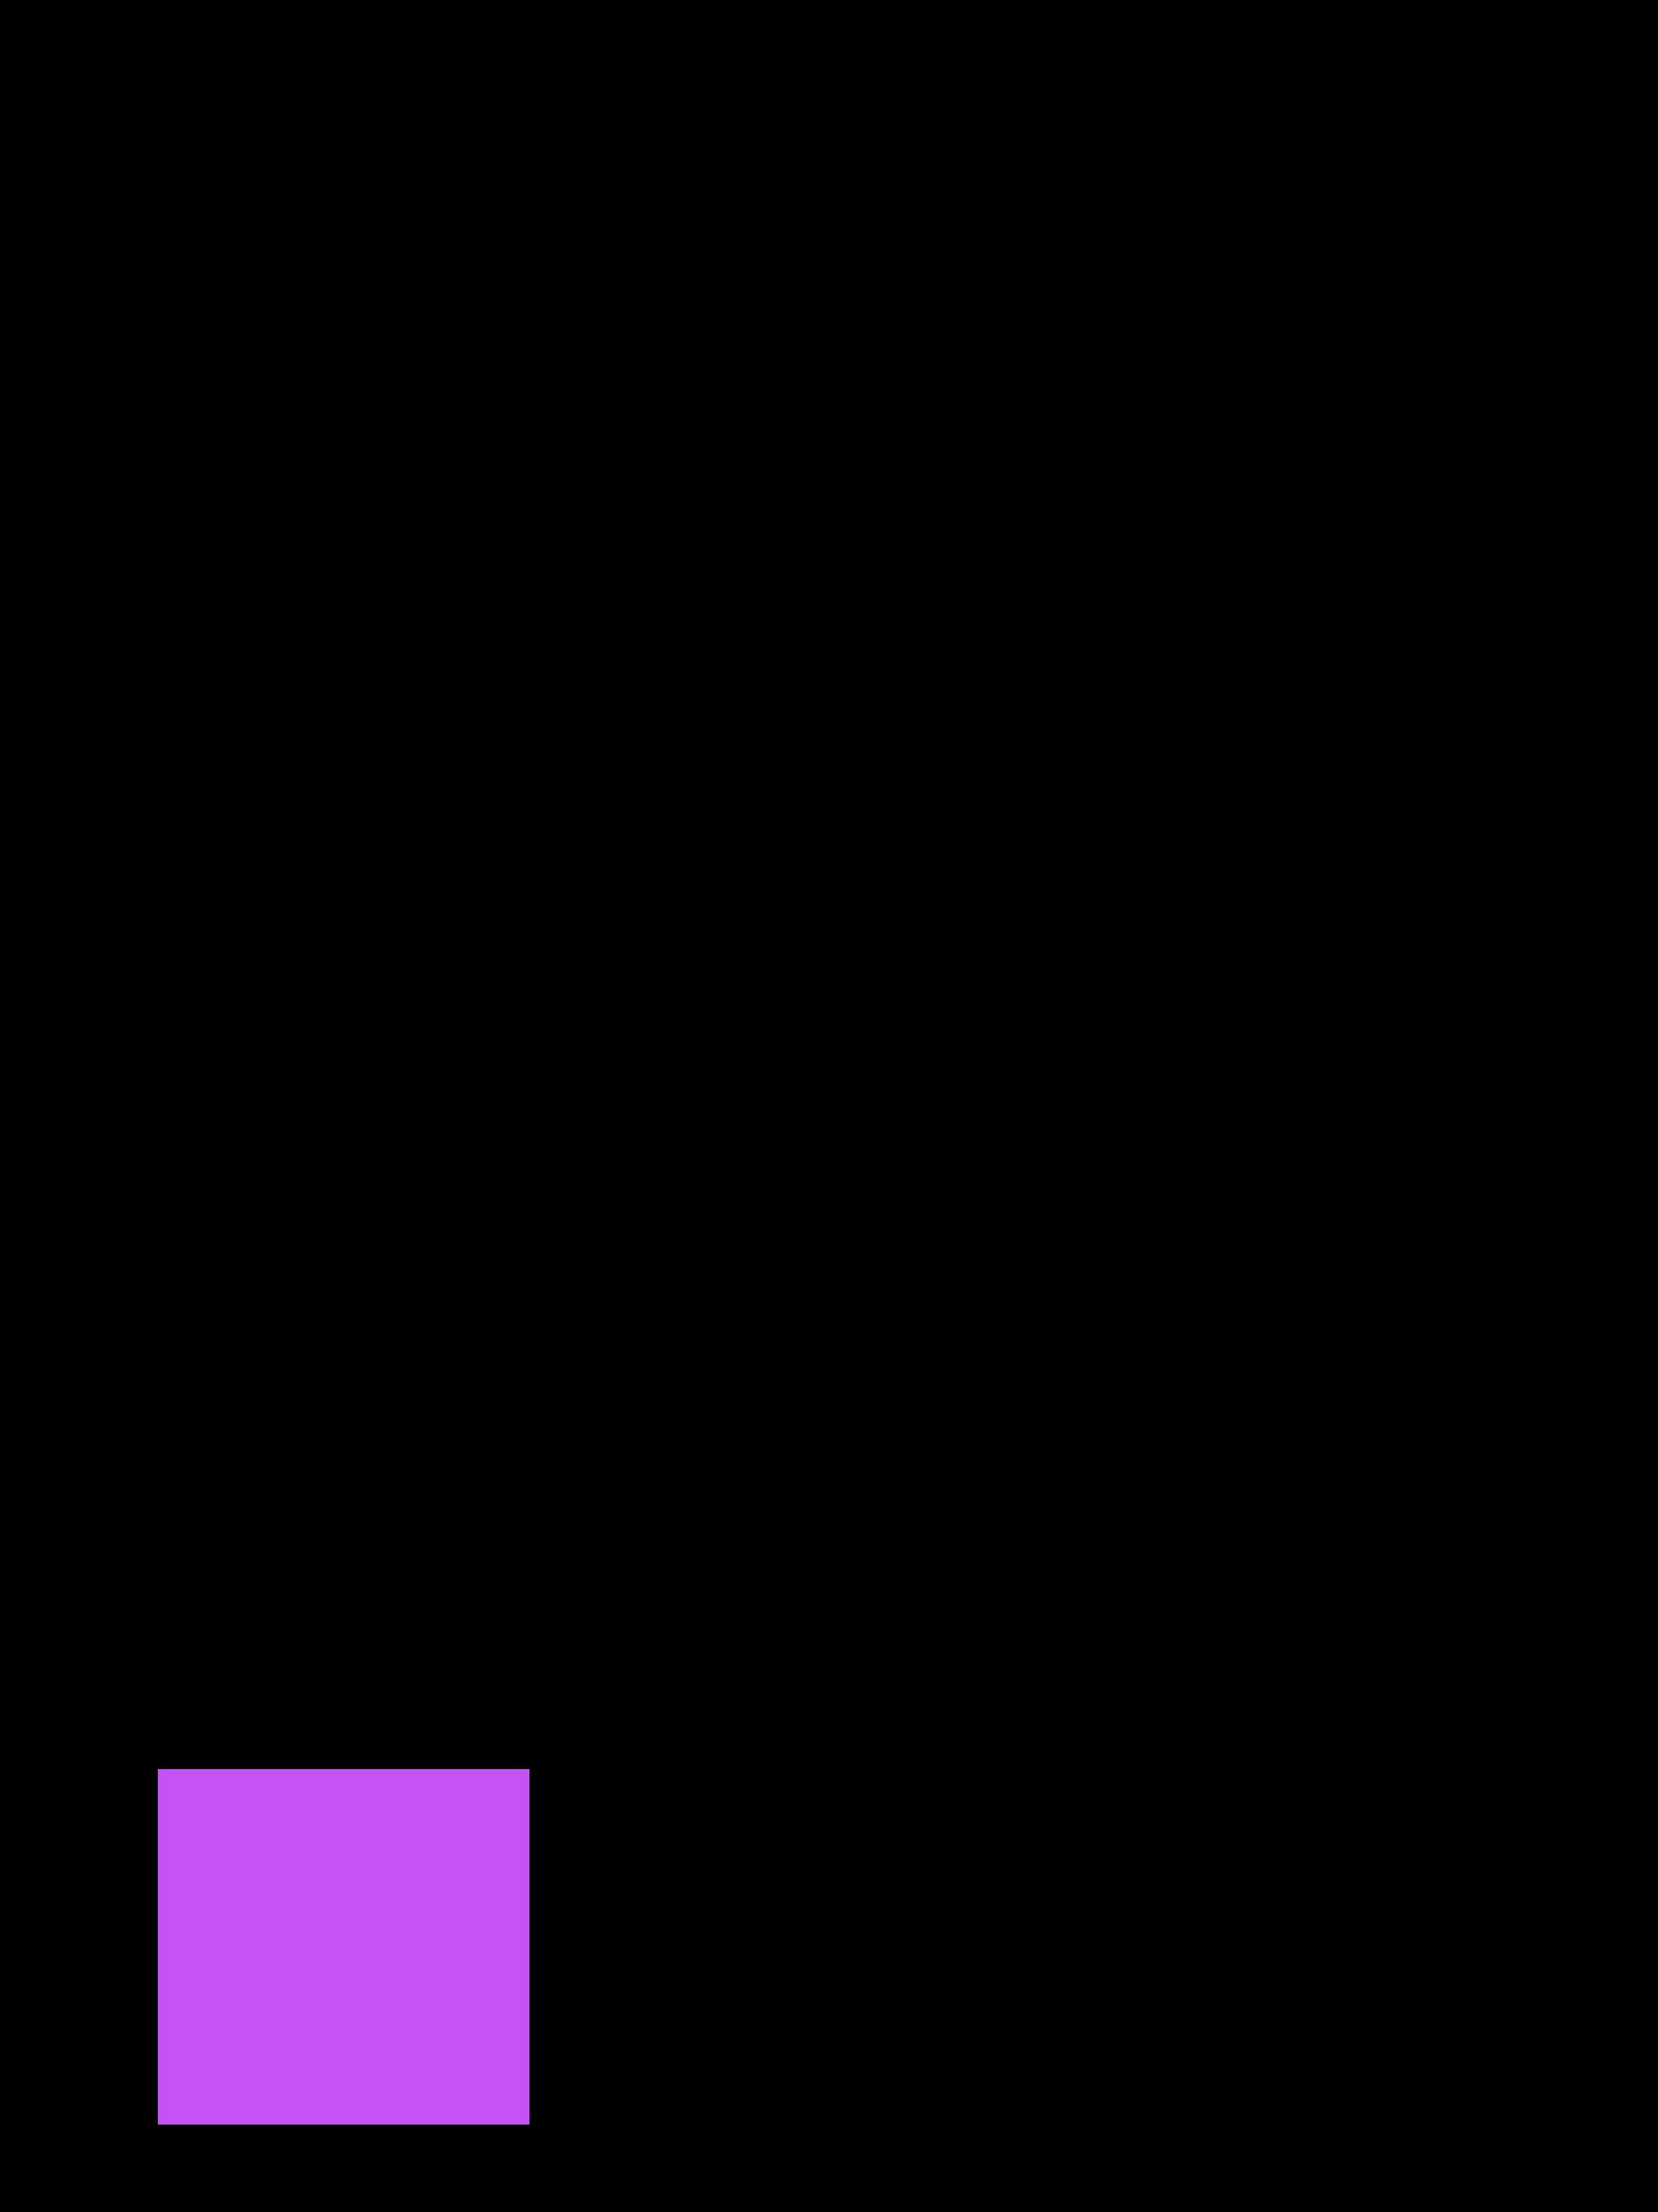 Ipad Vertical_2048x2732_Geo Heart_Purple.png